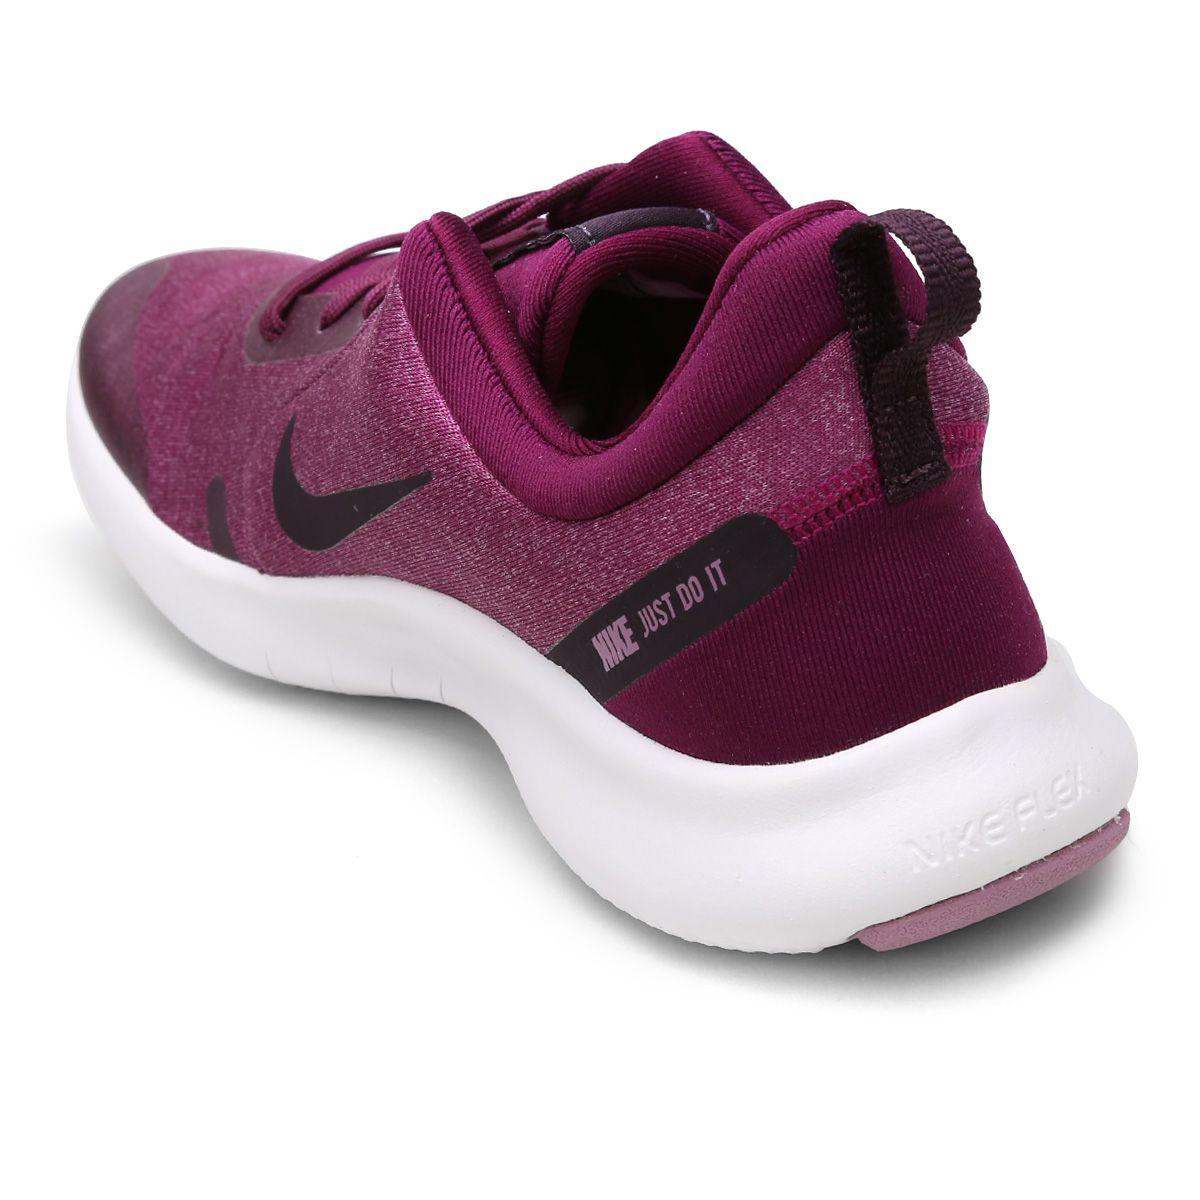 Tênis Feminino Nike Flex Experience Rn 8 - BRACIA SHOP  Loja de ... 8af1f14accc